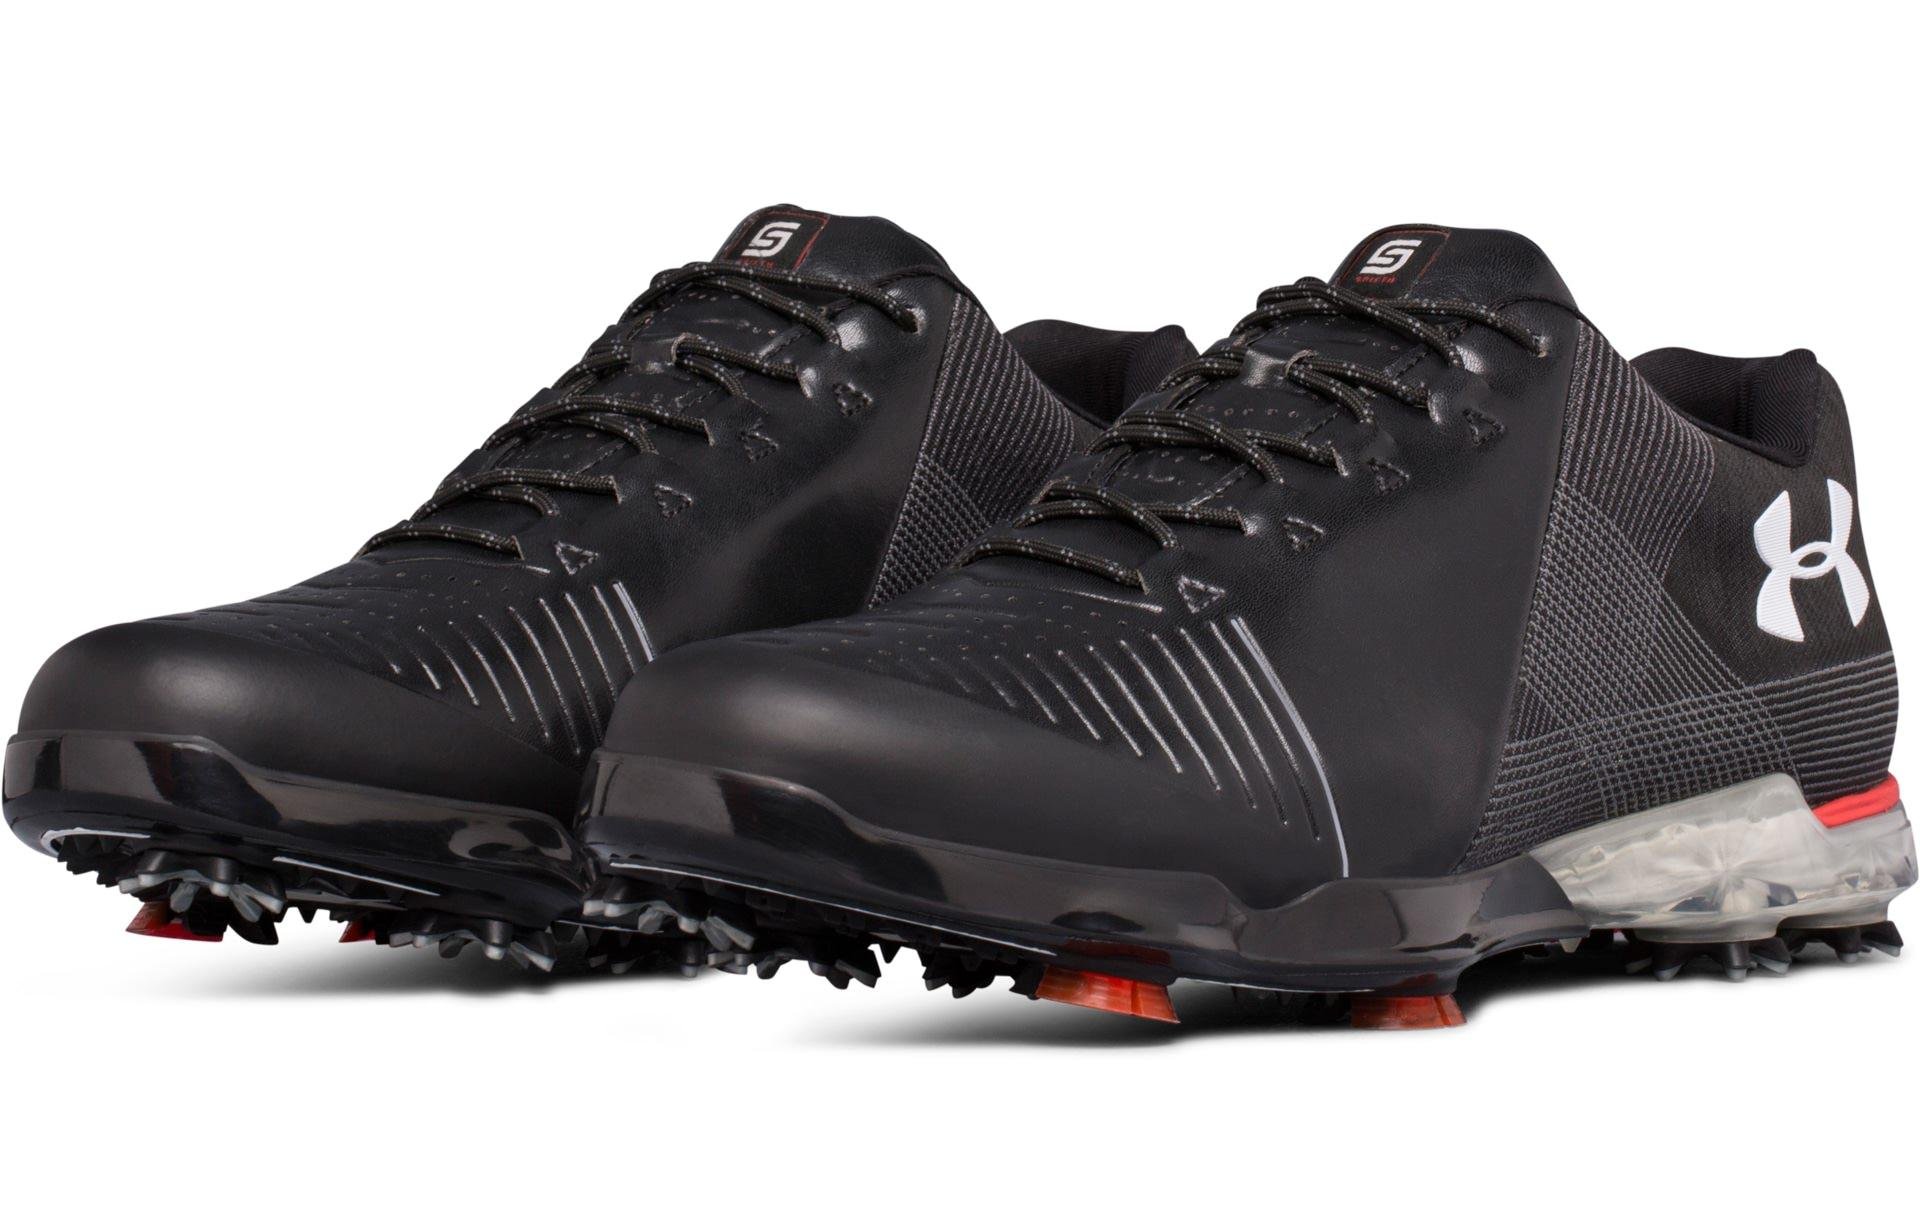 Spieth 2 shoes